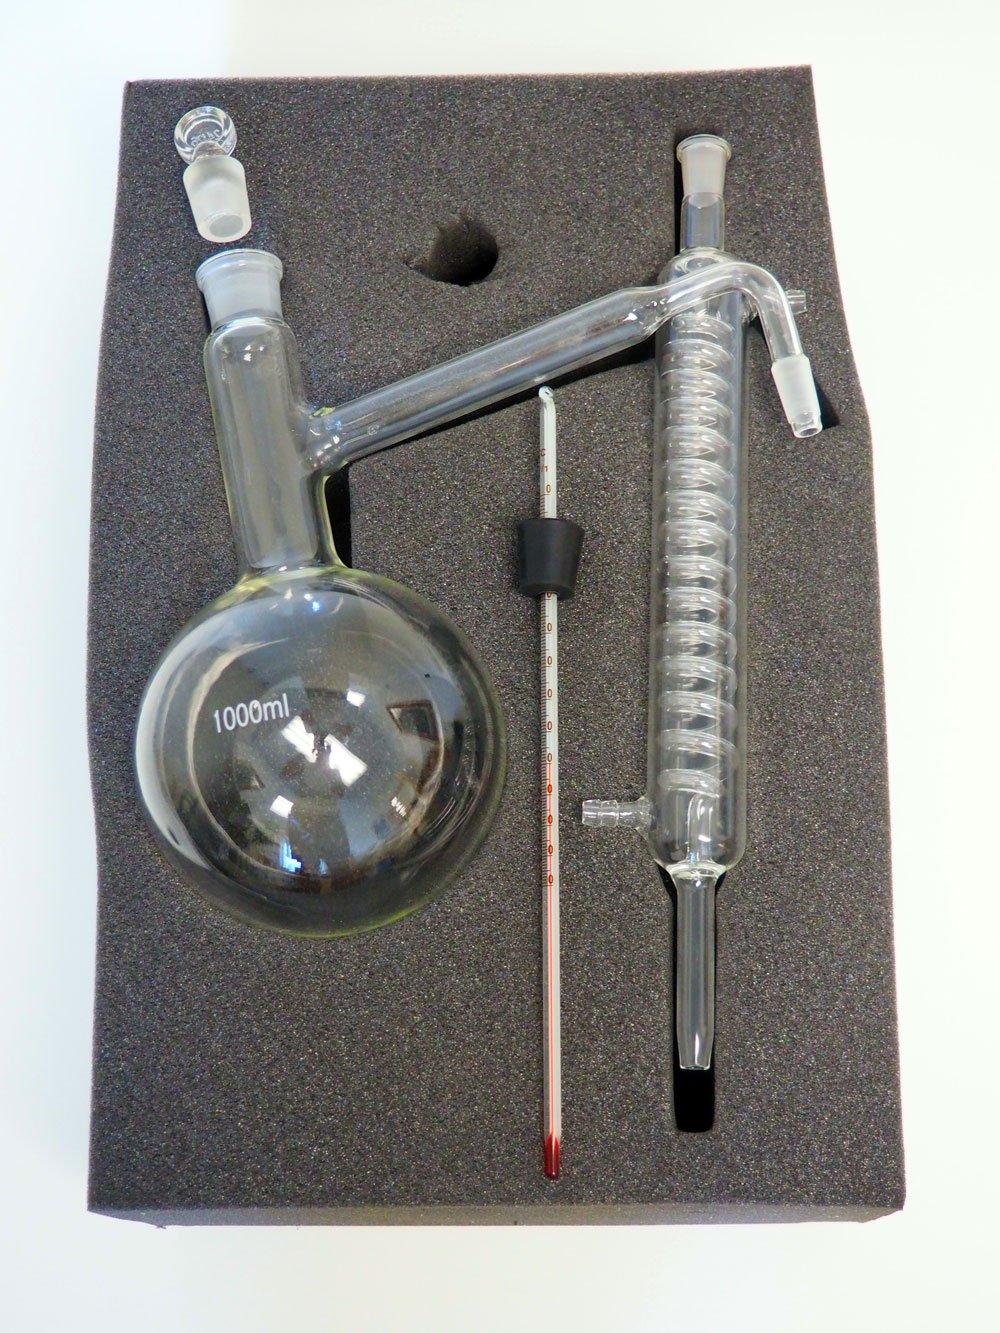 Distillation Glassware Kit, 1000ml